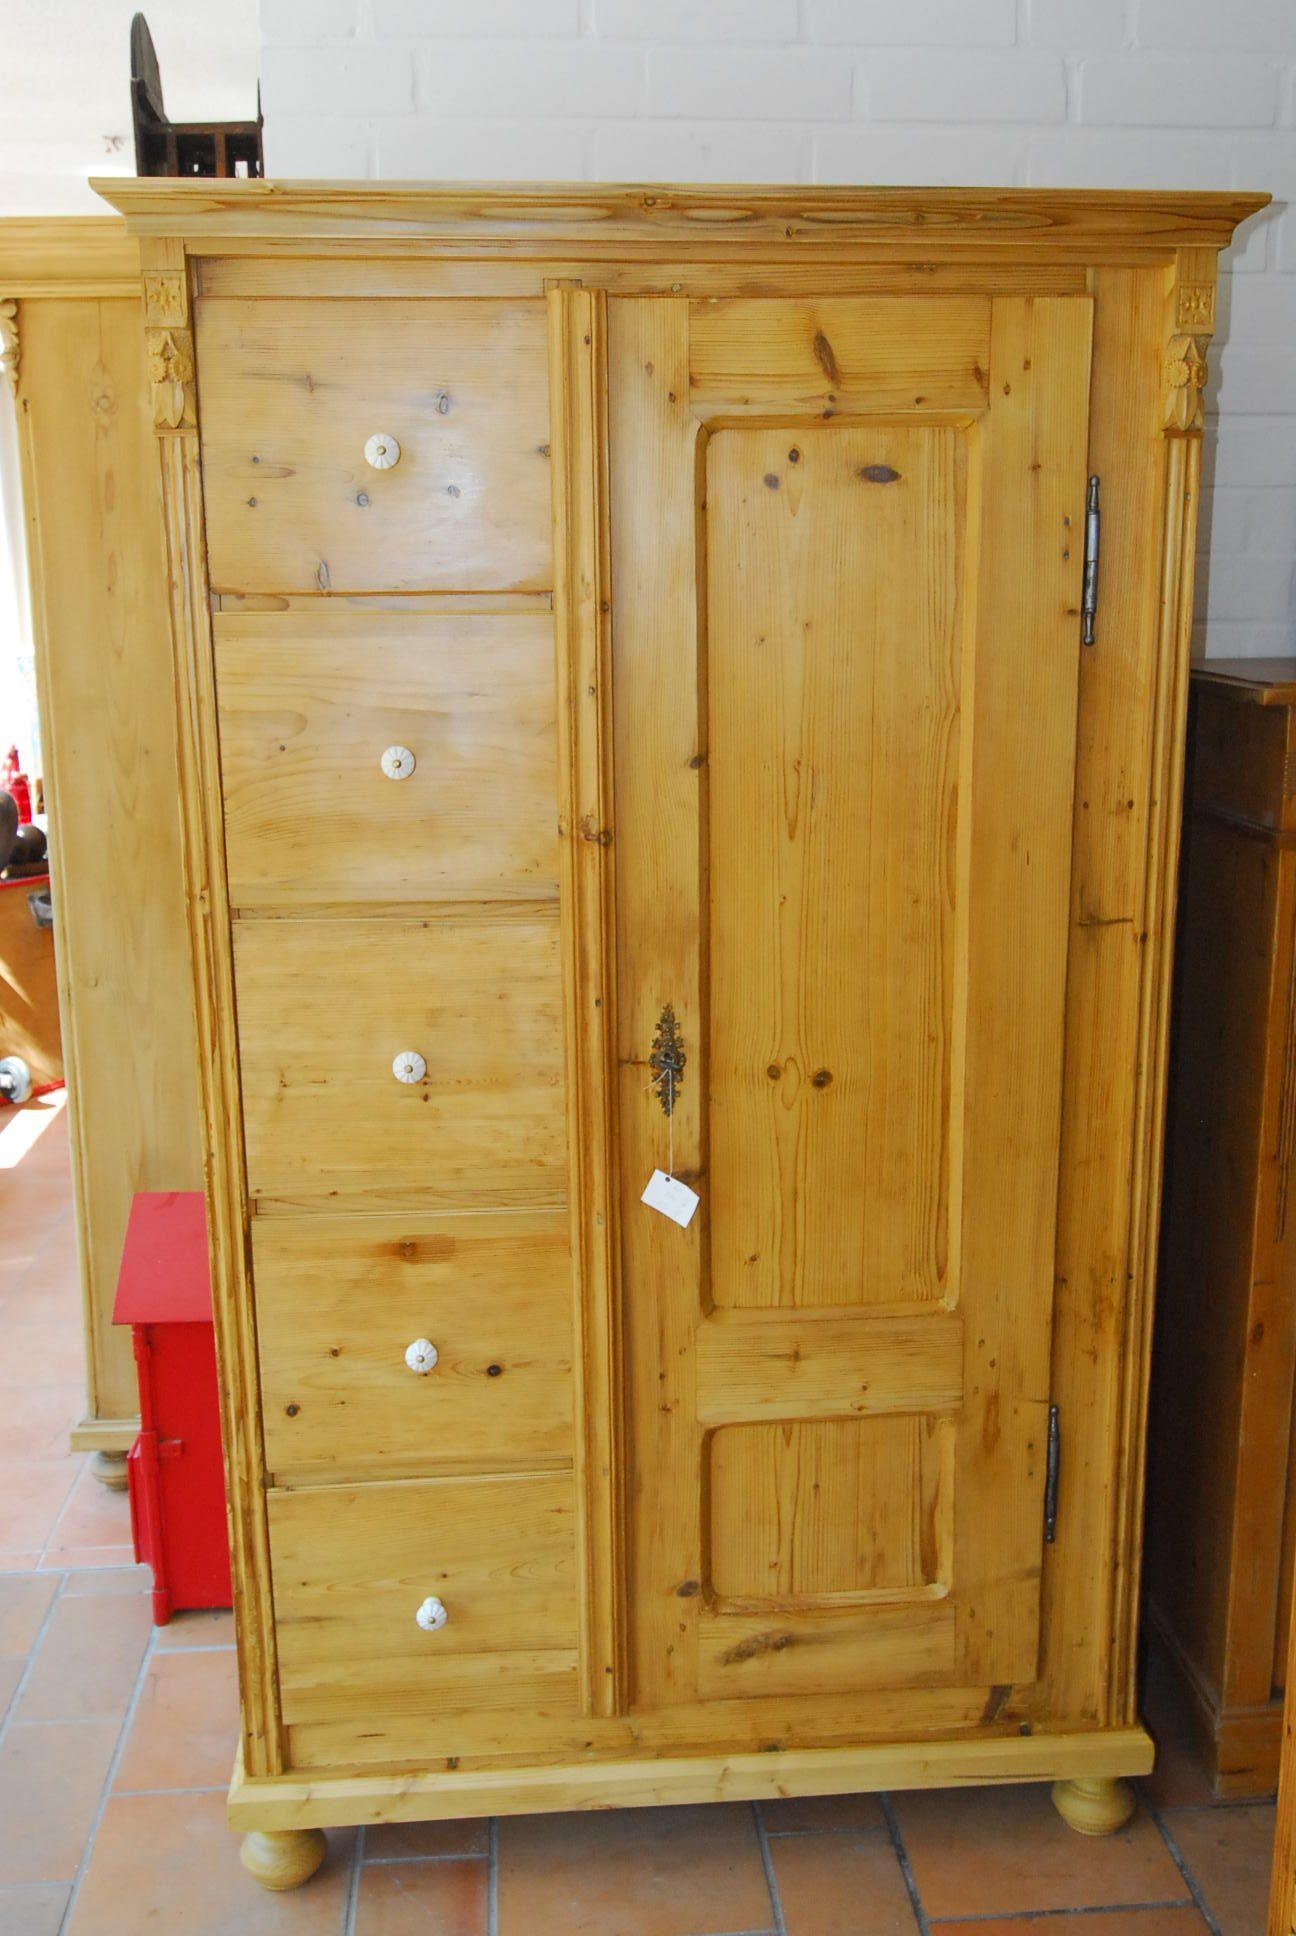 Schrank 3  H 177 cm  B 106 cm  T 49 cm  1.190 €